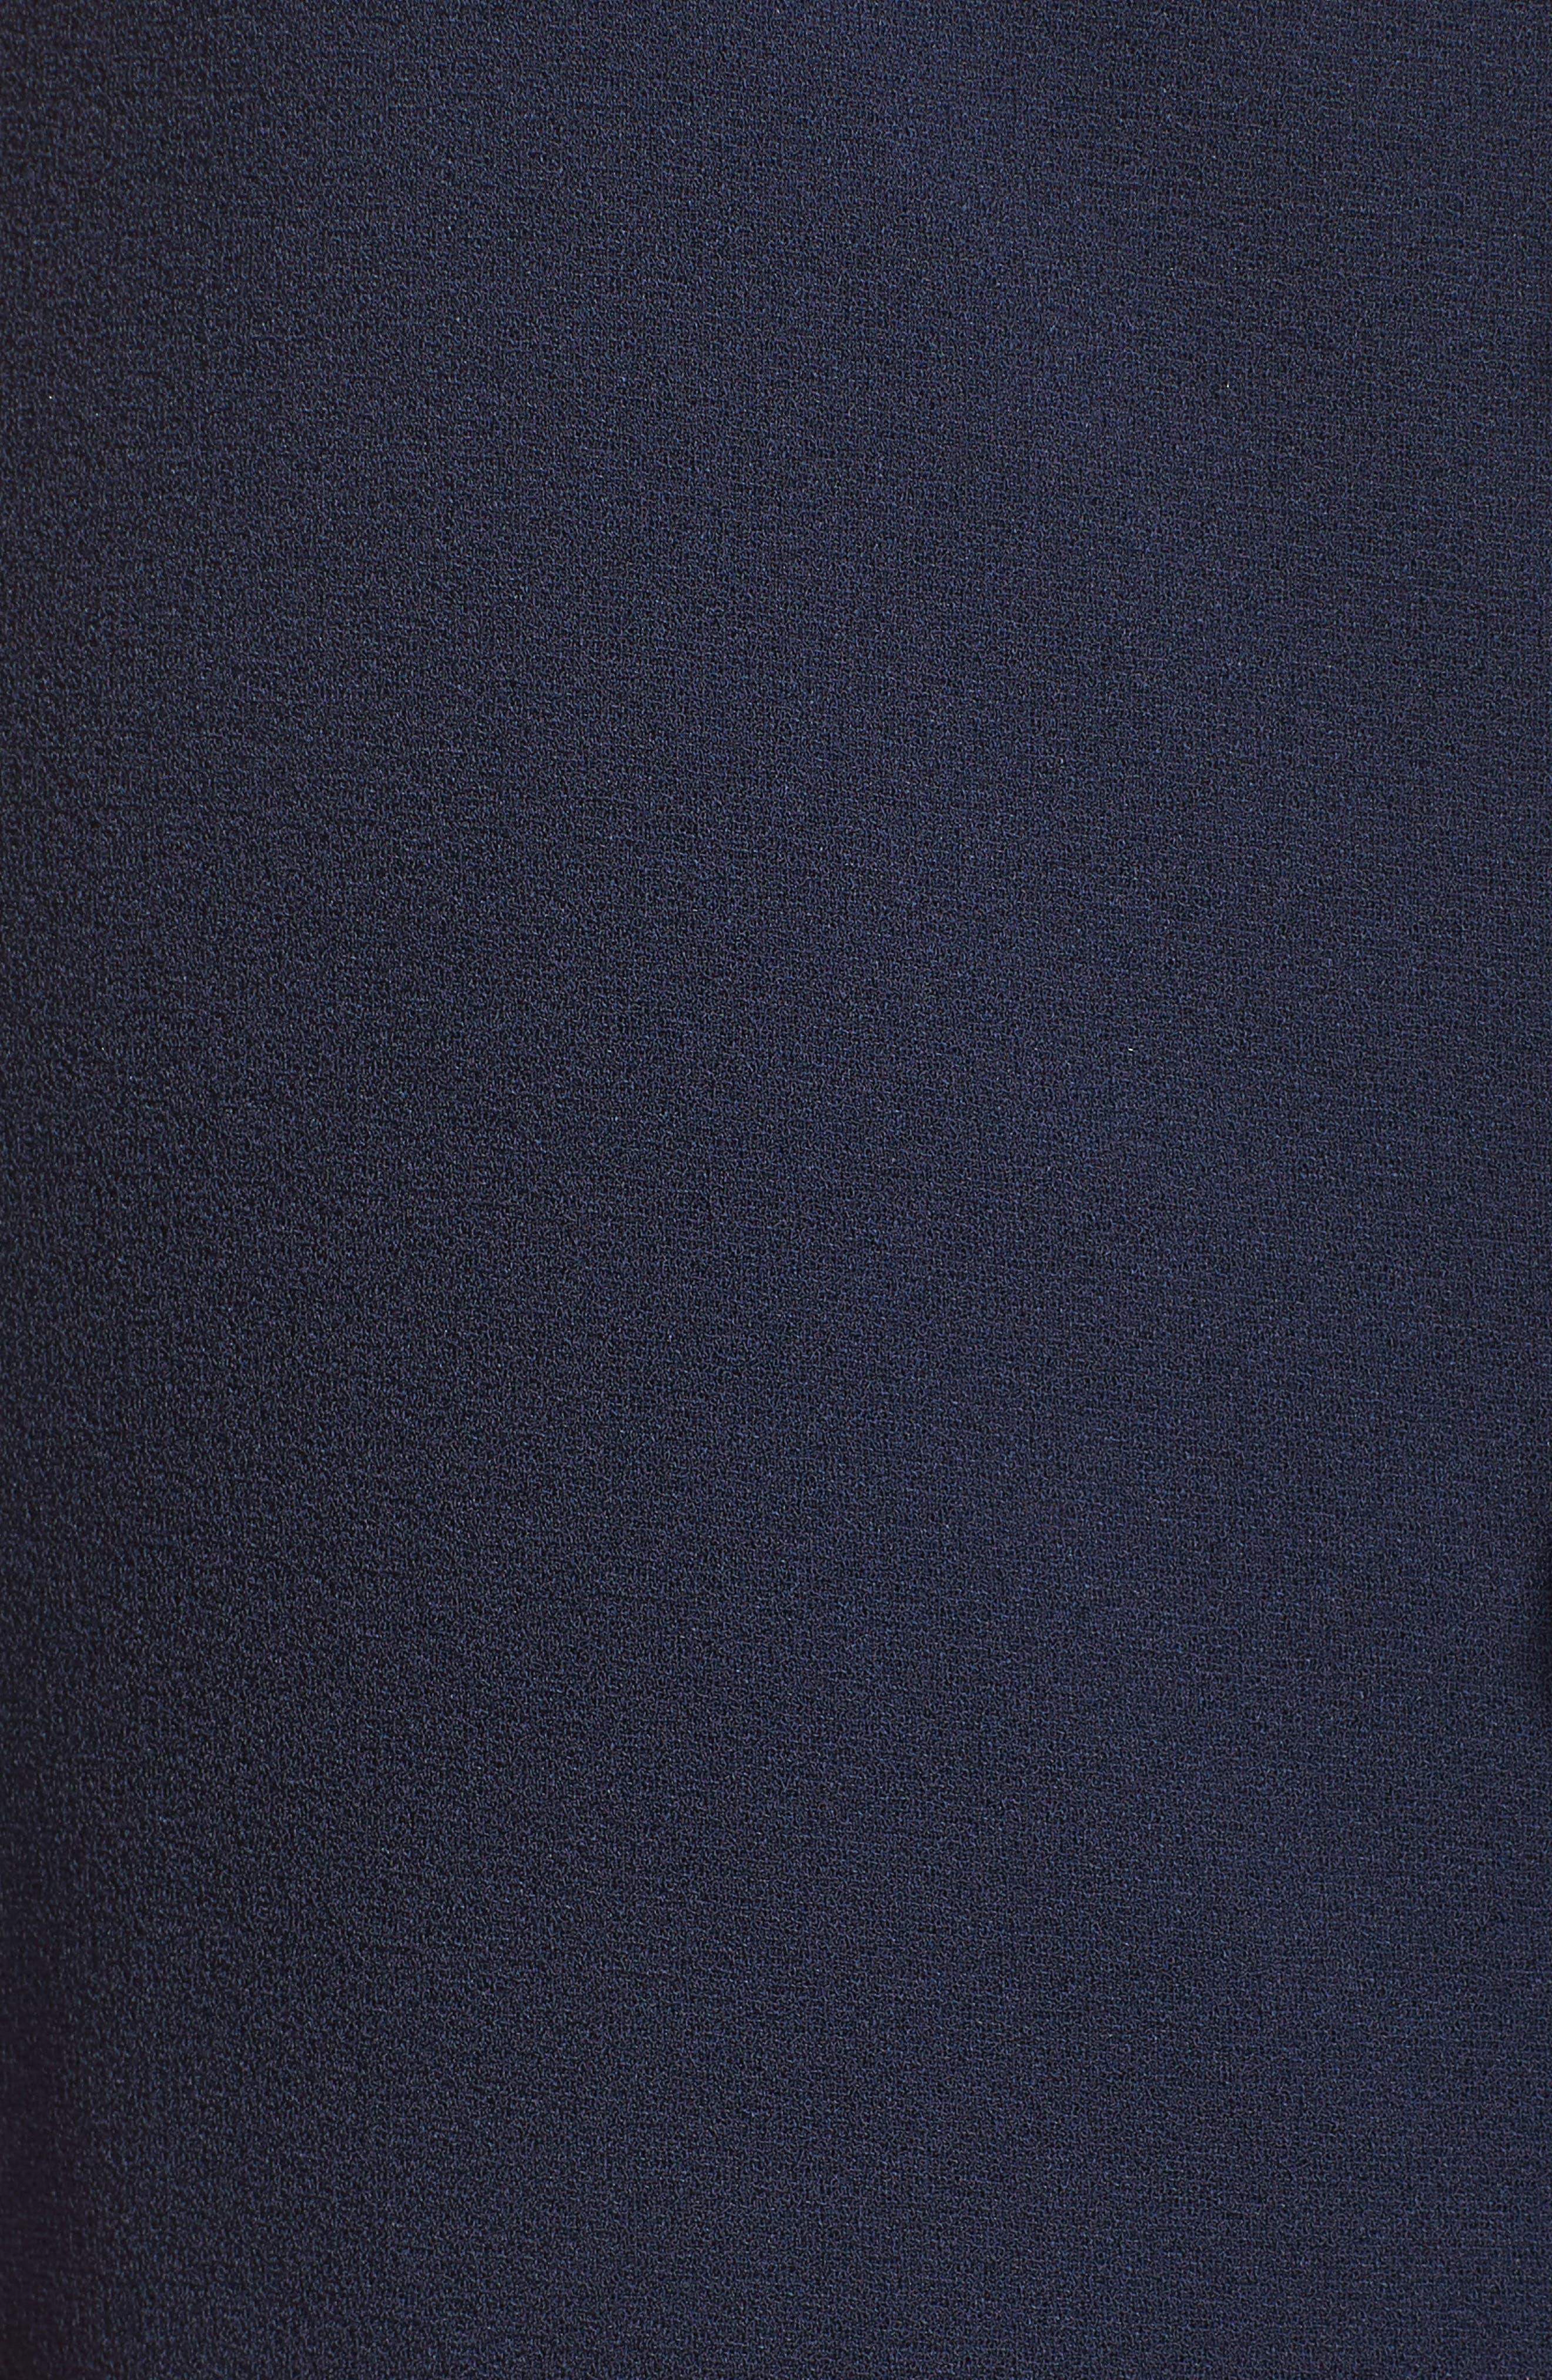 Sleeveless Crepe Ruffle Dress,                             Alternate thumbnail 6, color,                             Navy